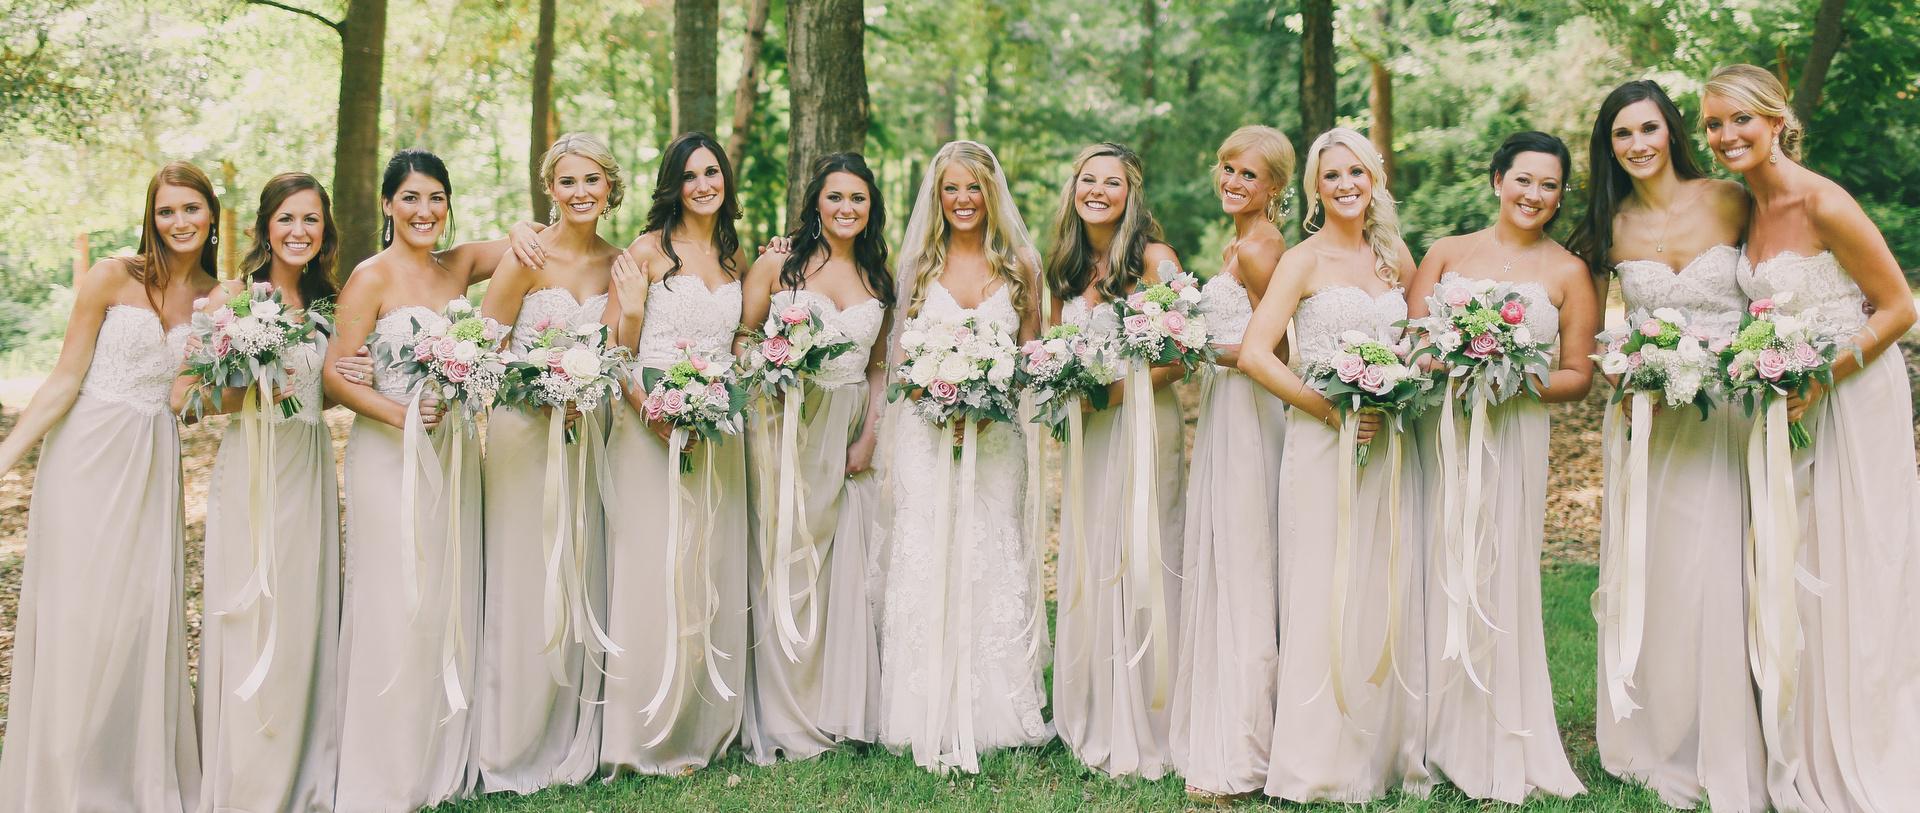 Whitney&bridesmaids.jpg